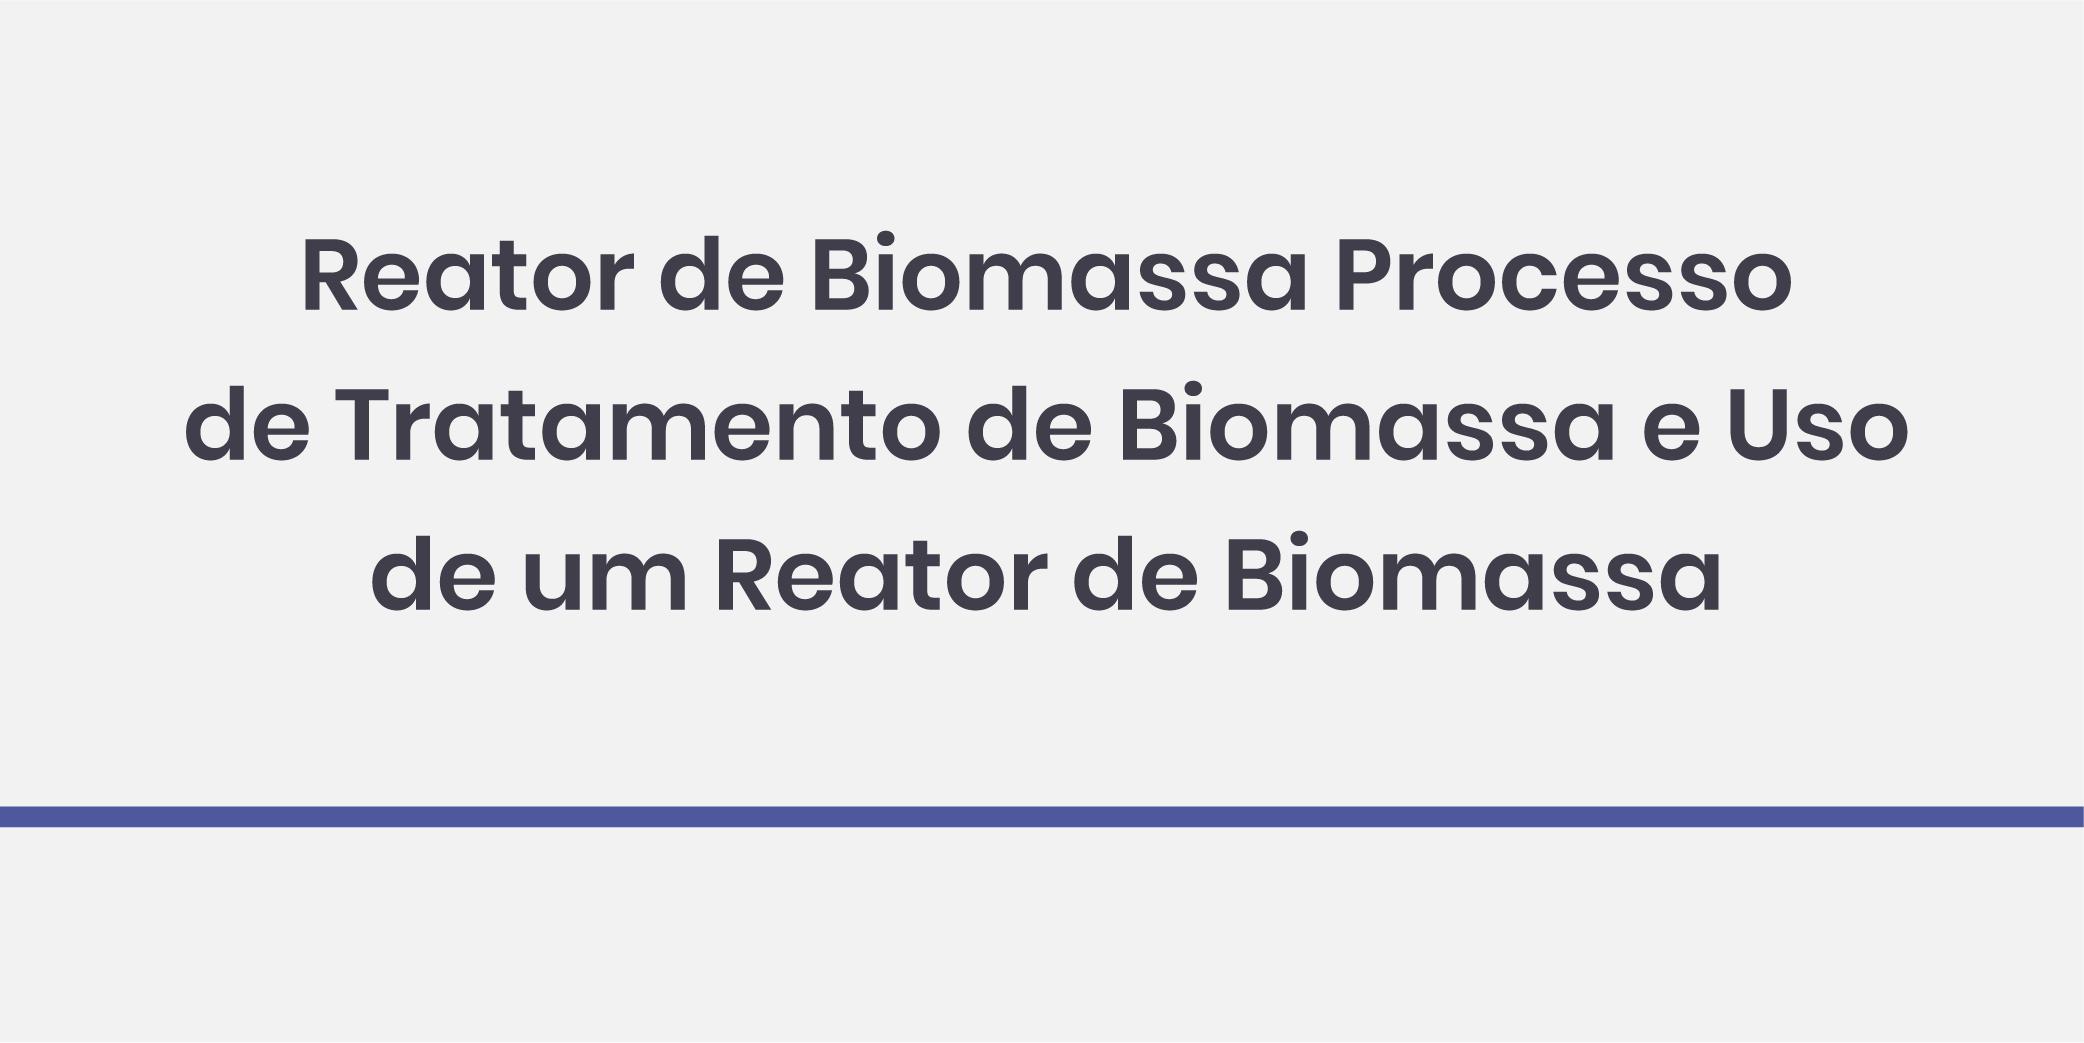 Reator de Biomassa Processo de Tratamento de Biomassa e Uso de um Reator de Biomassa